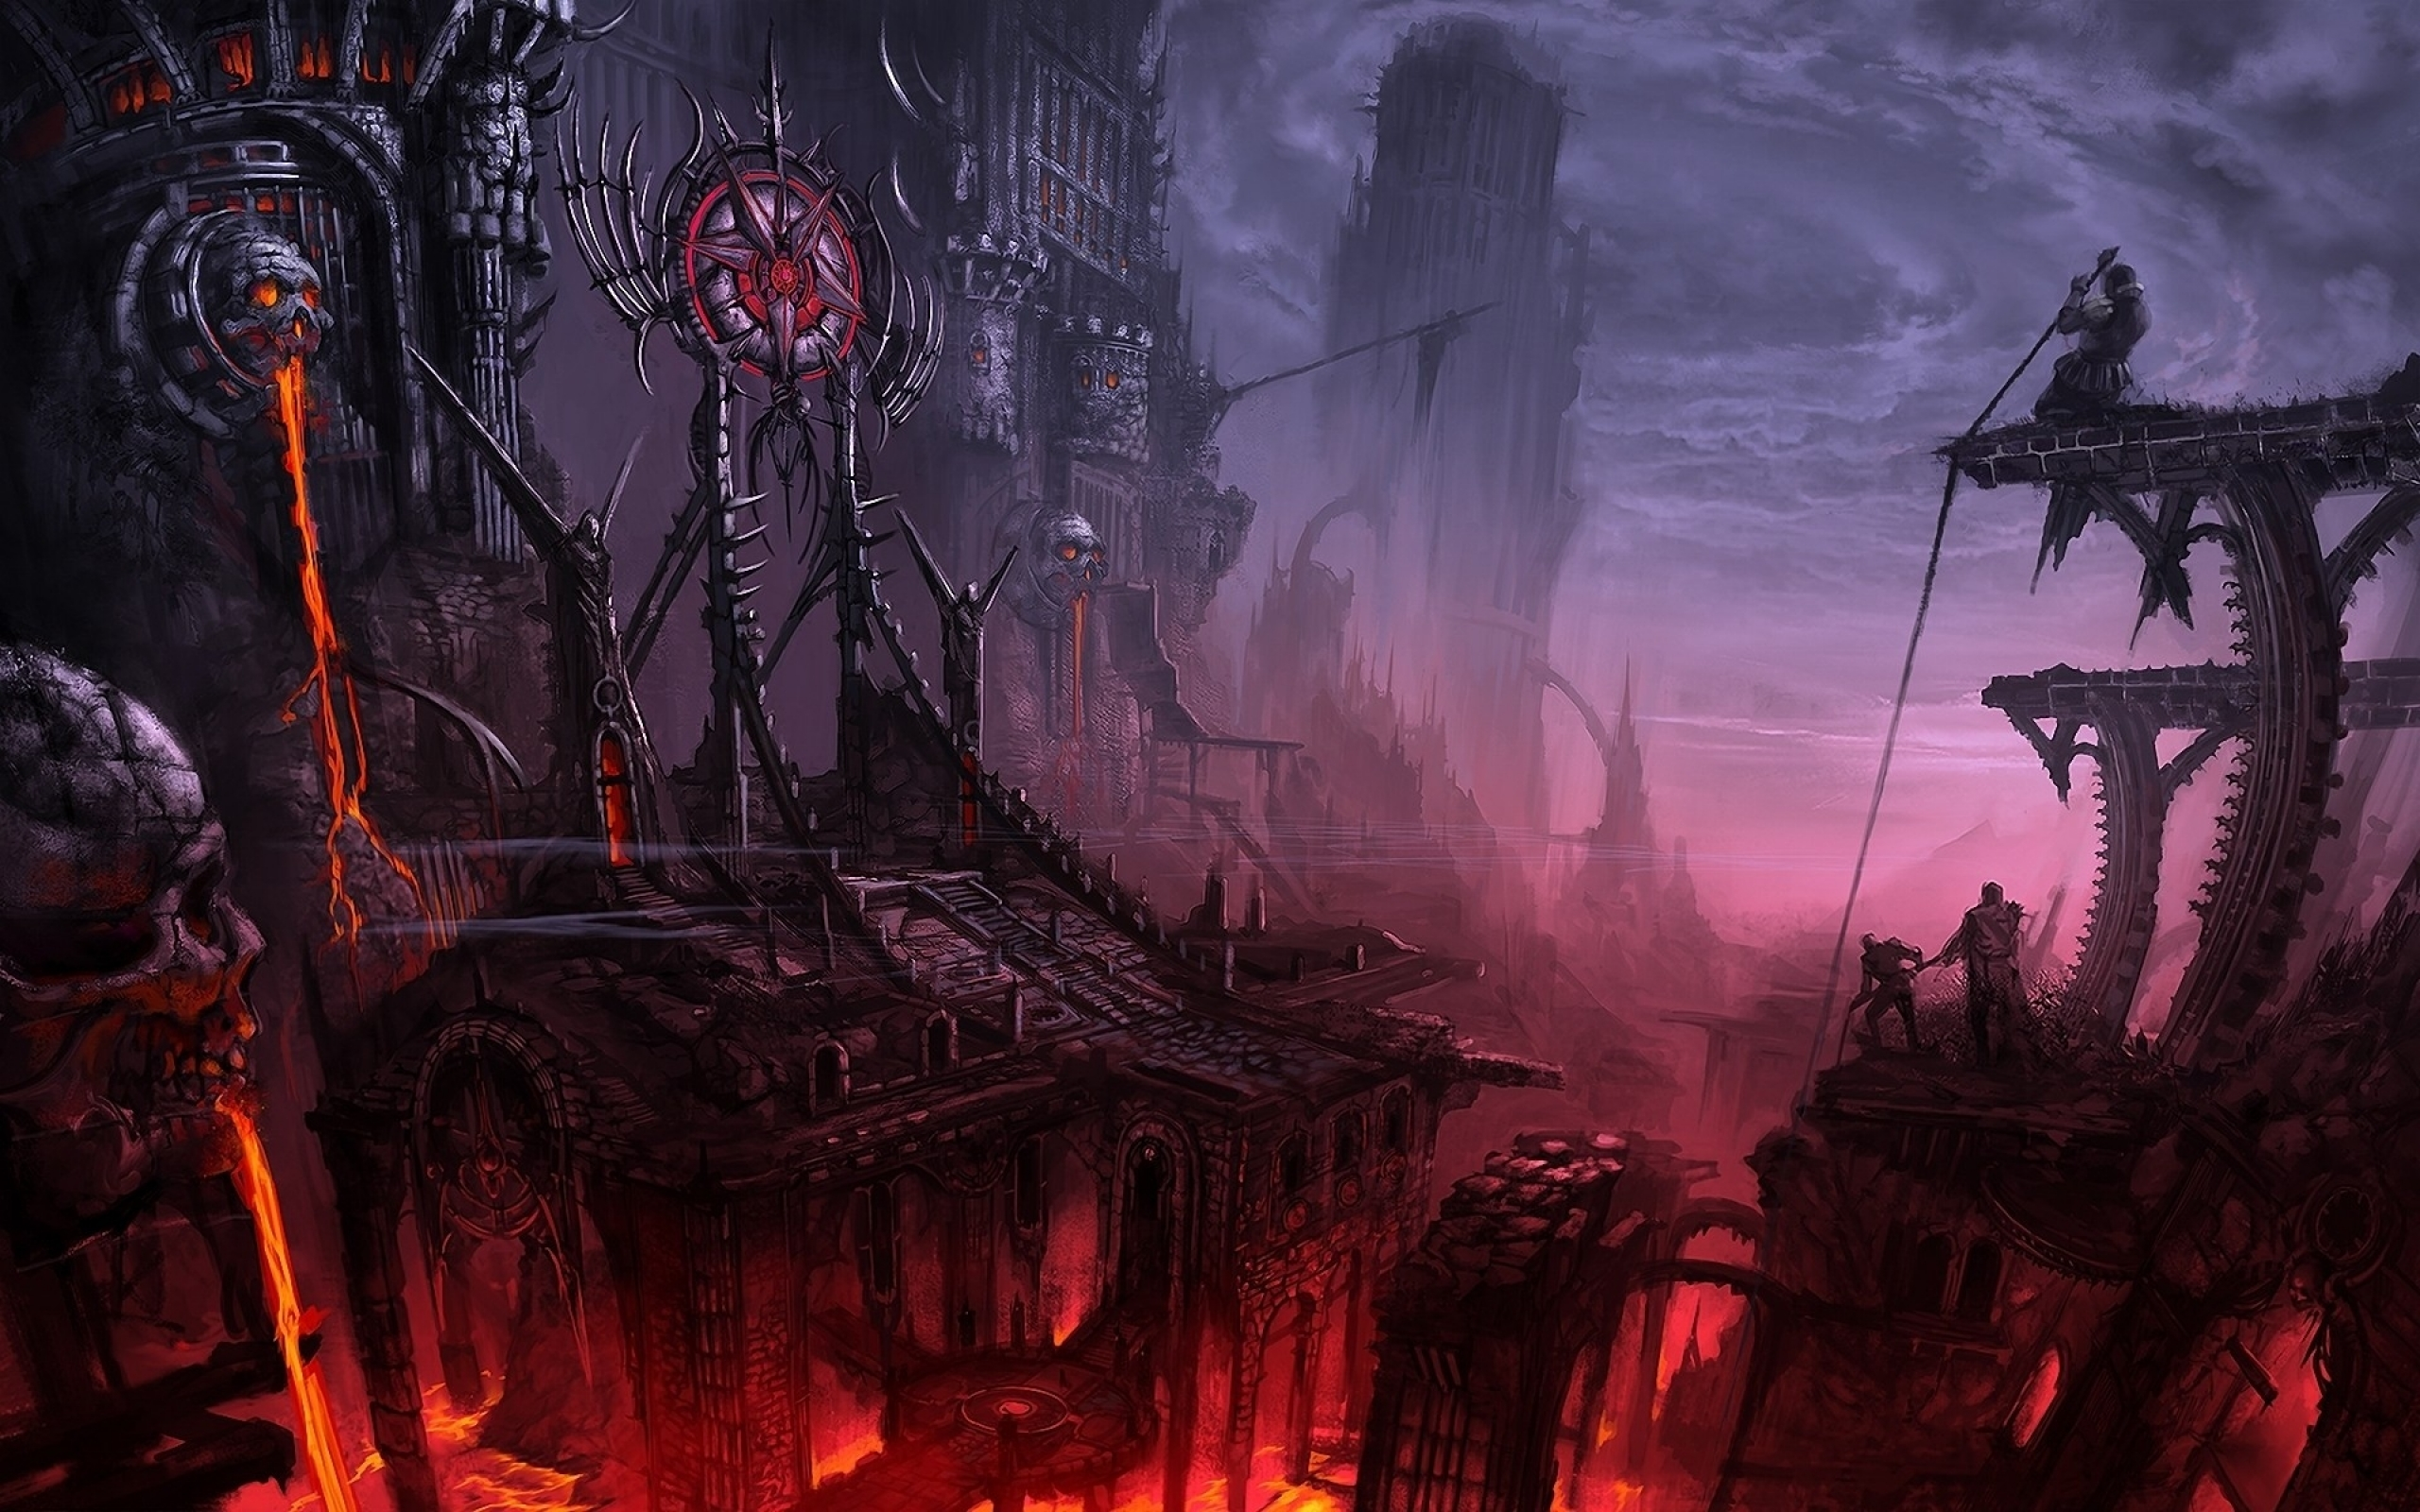 Red Lava Fantasy Art Artwork Magma Art Id 56467 Art Abyss